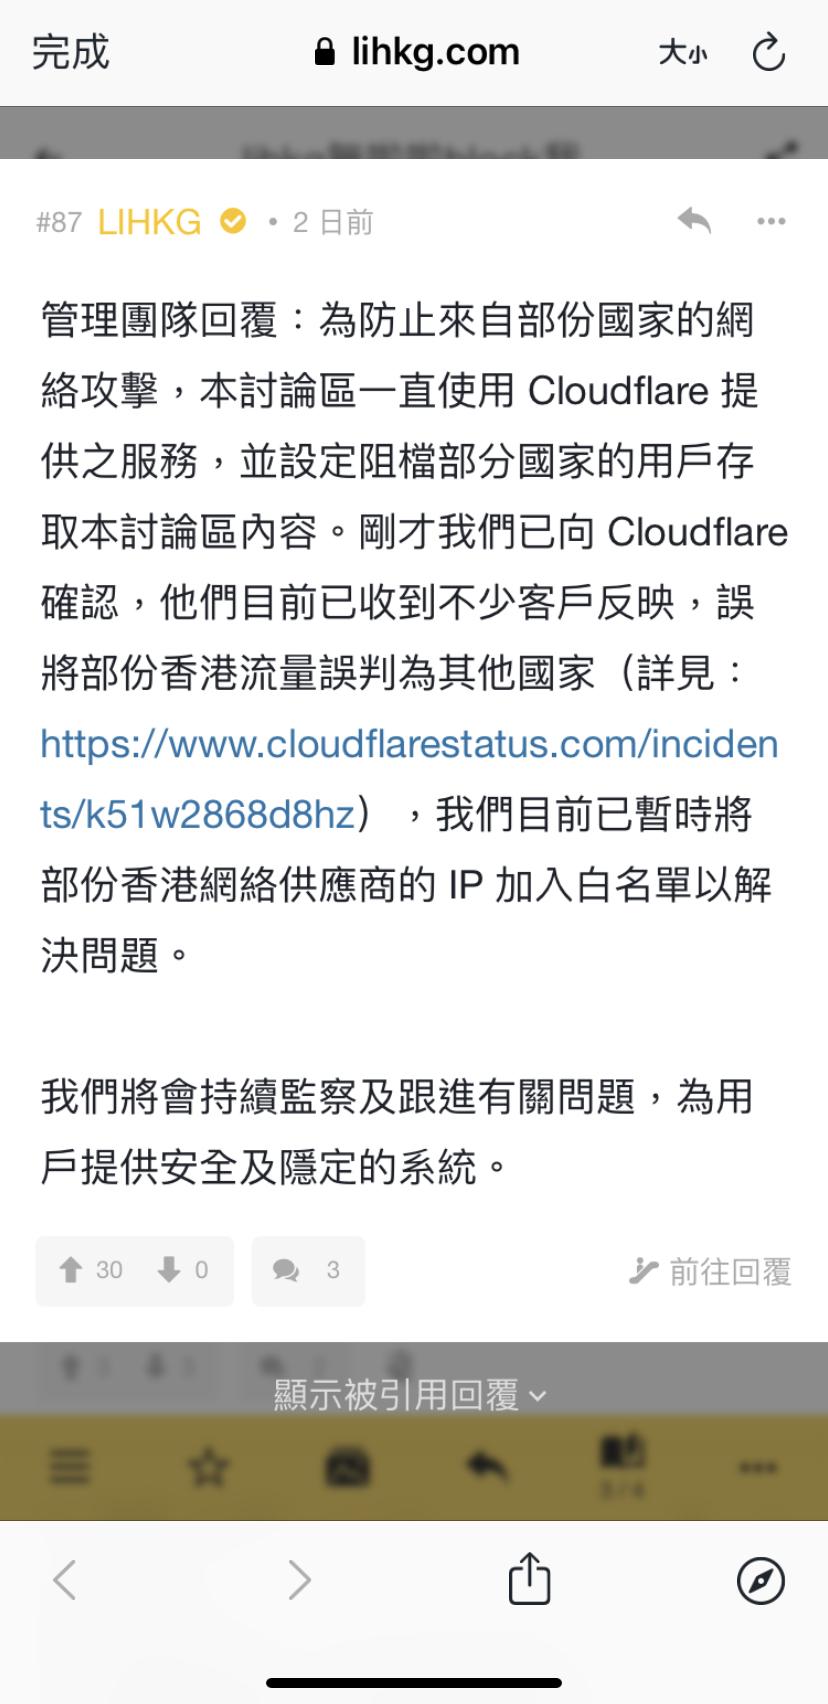 https://upload.hkgolden.media/comment/fuv3twu2.rhii2vbxok5.xiapot4vilh.tsf.jpg